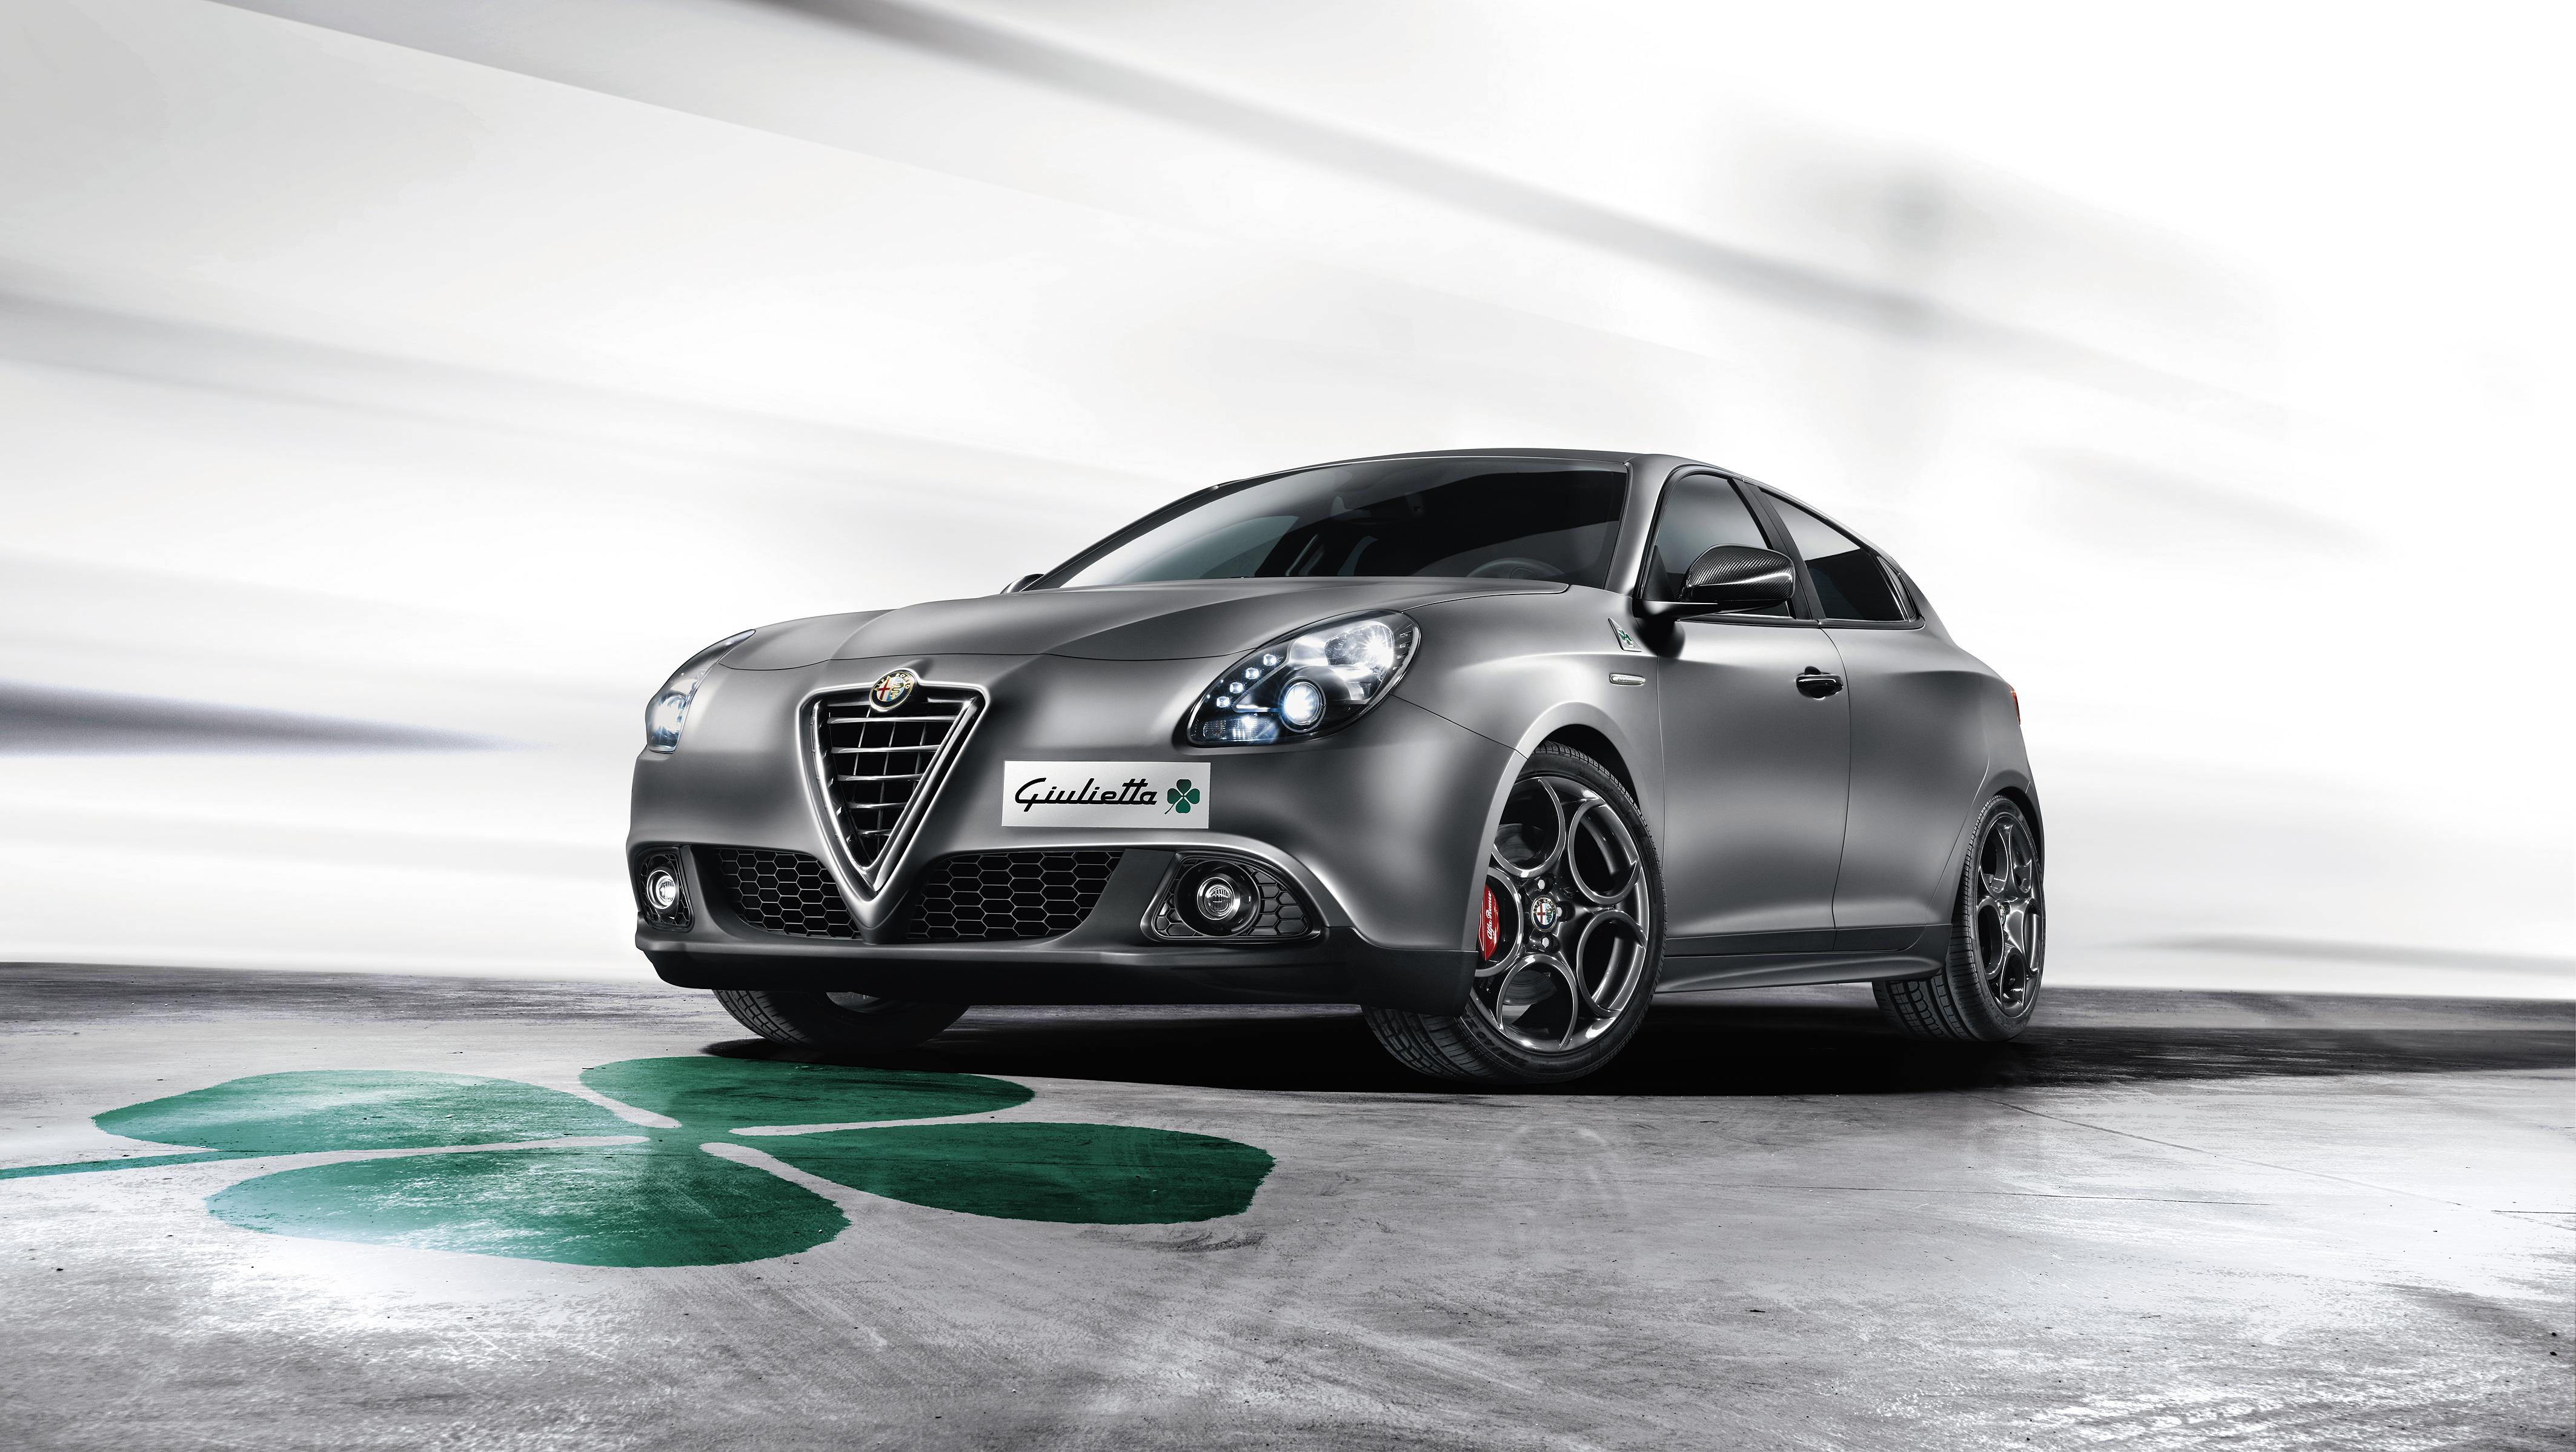 Alfa Romeo Giulia >> Neues Giulietta Topmodell Quadrifoglio Verde TCT - Pressetexte - FCA Germany AG - Pressesystem